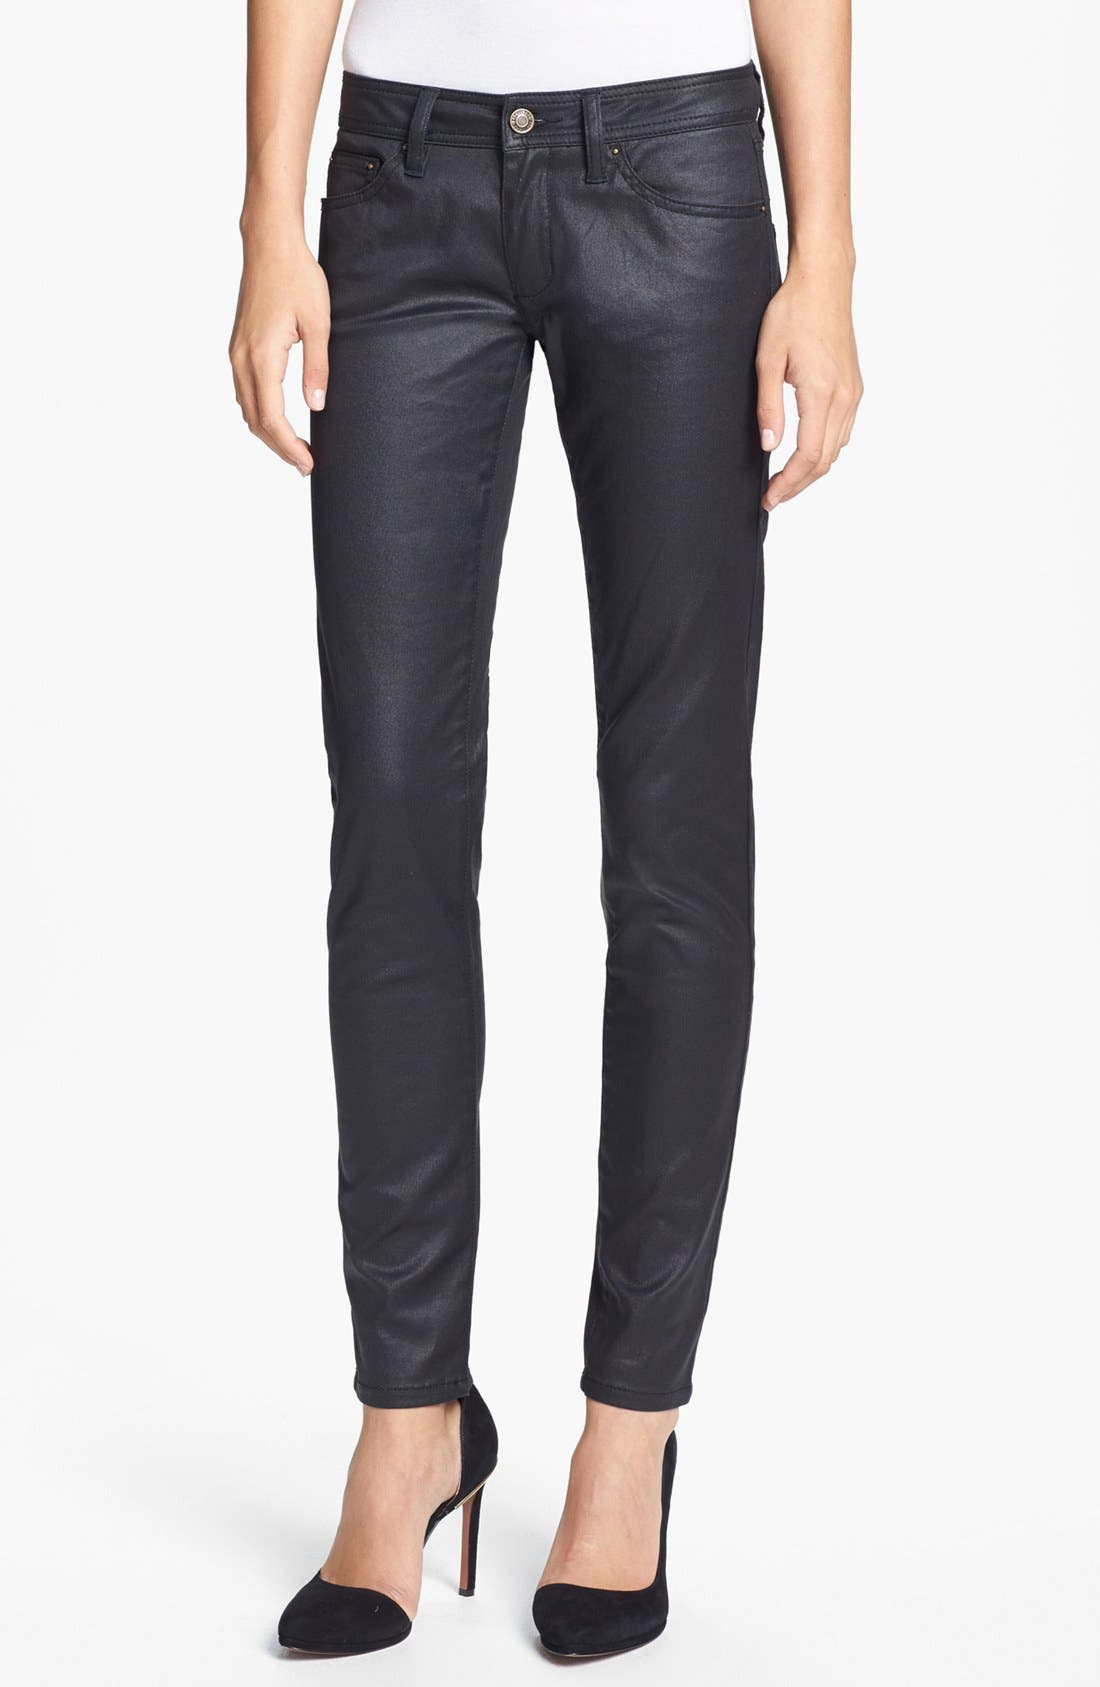 Alternate Image 1 Selected - Rachel Zoe 'Julie' Skinny High Gloss Coated Jeans